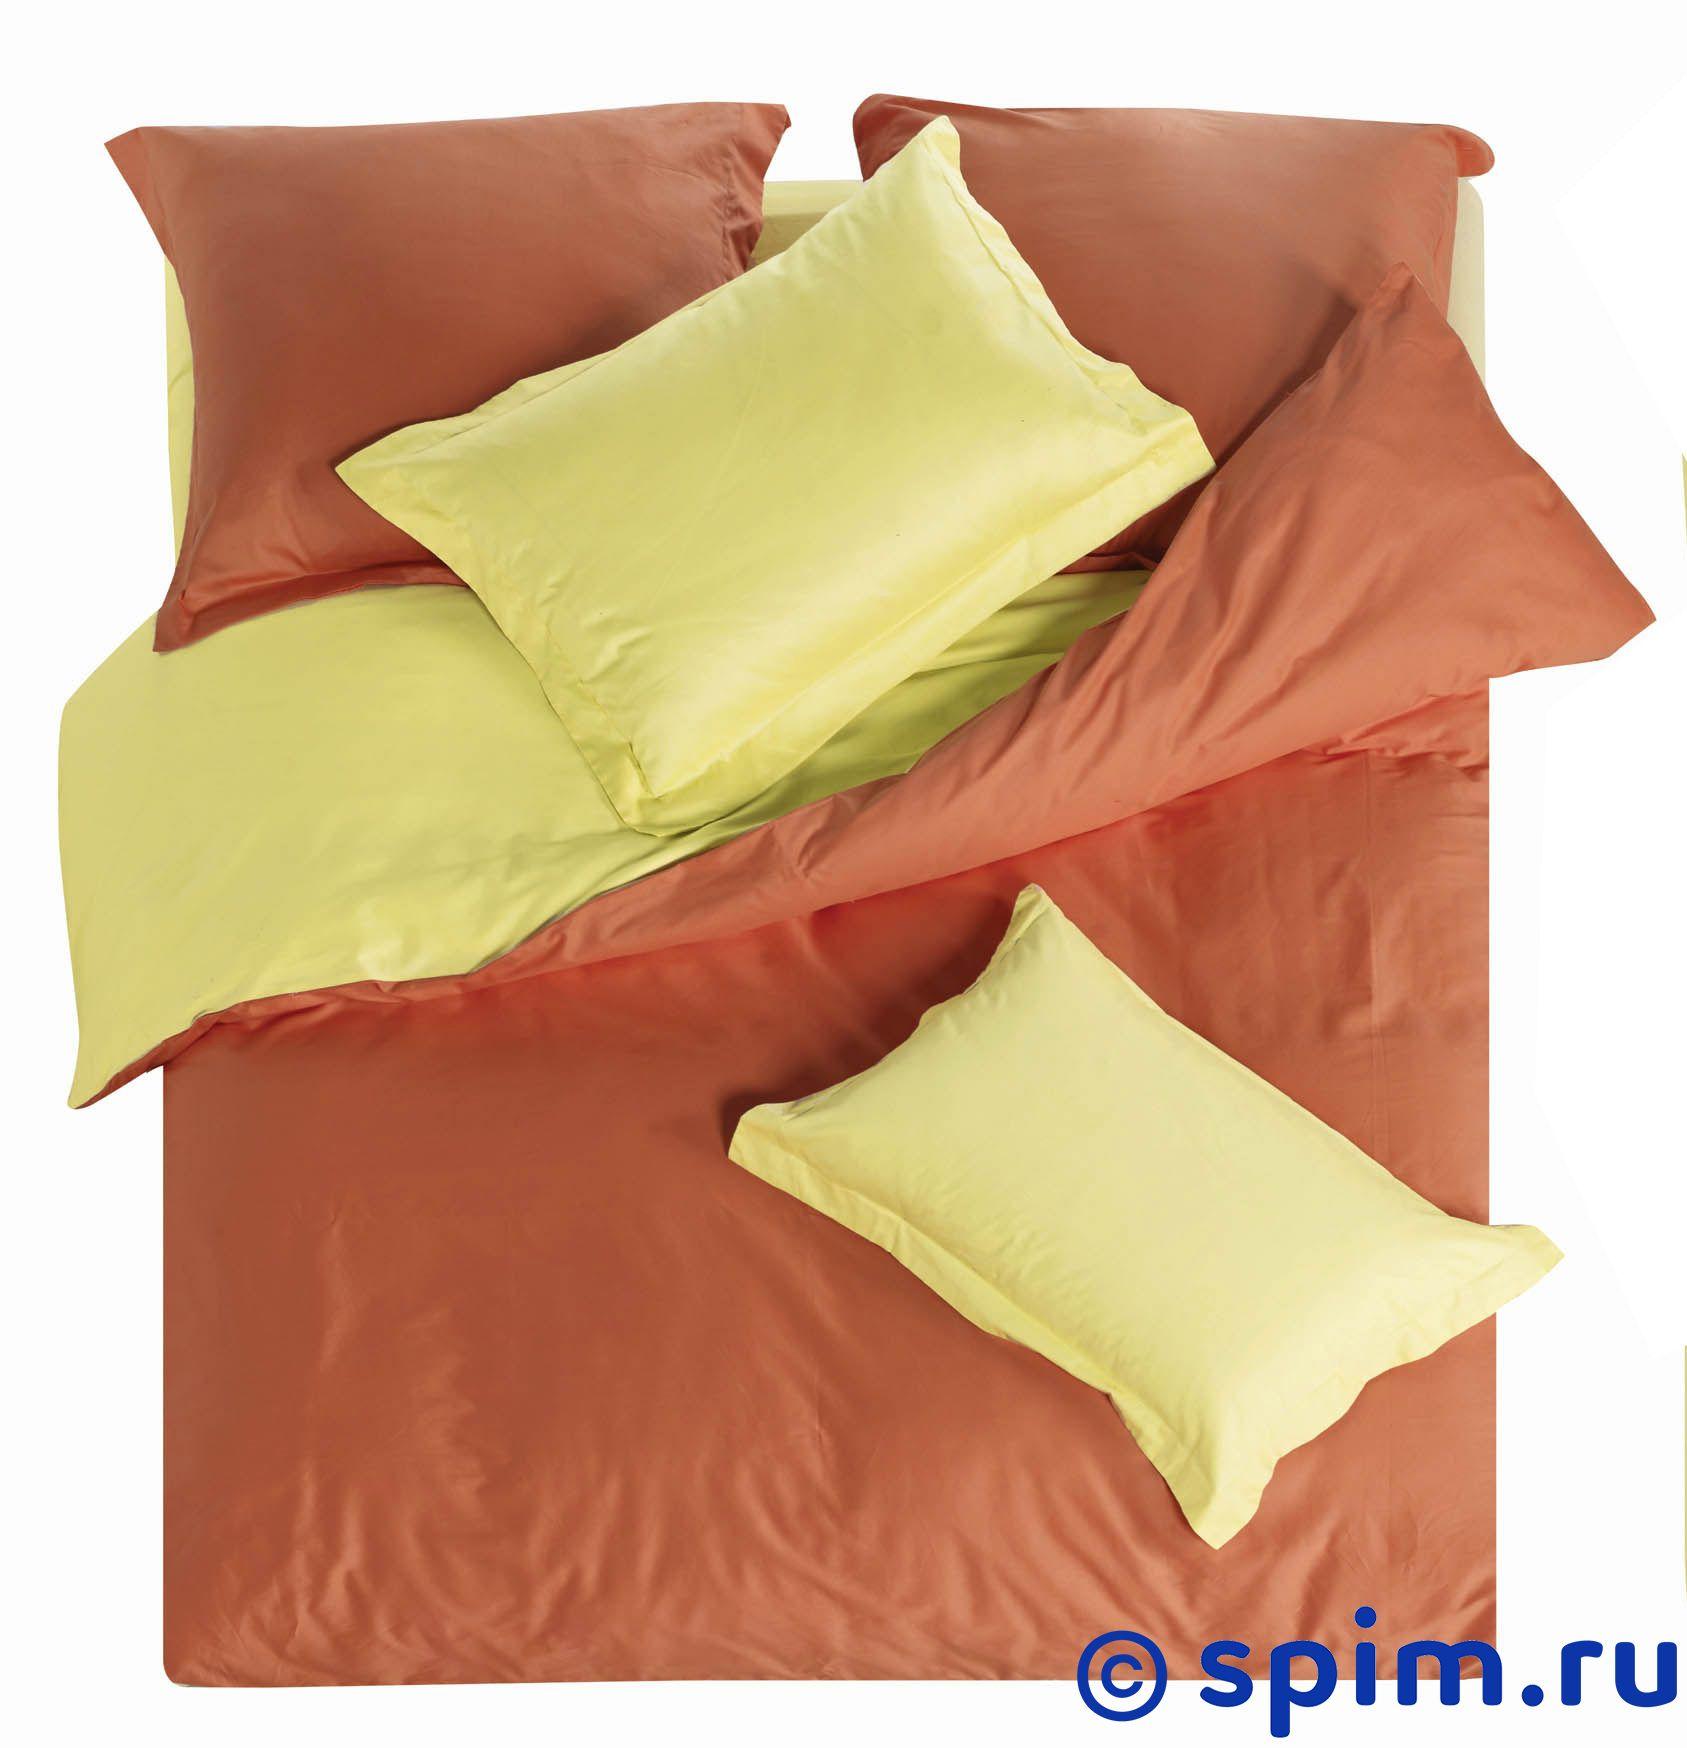 Комплект СайлиД L2 1.5 спальное